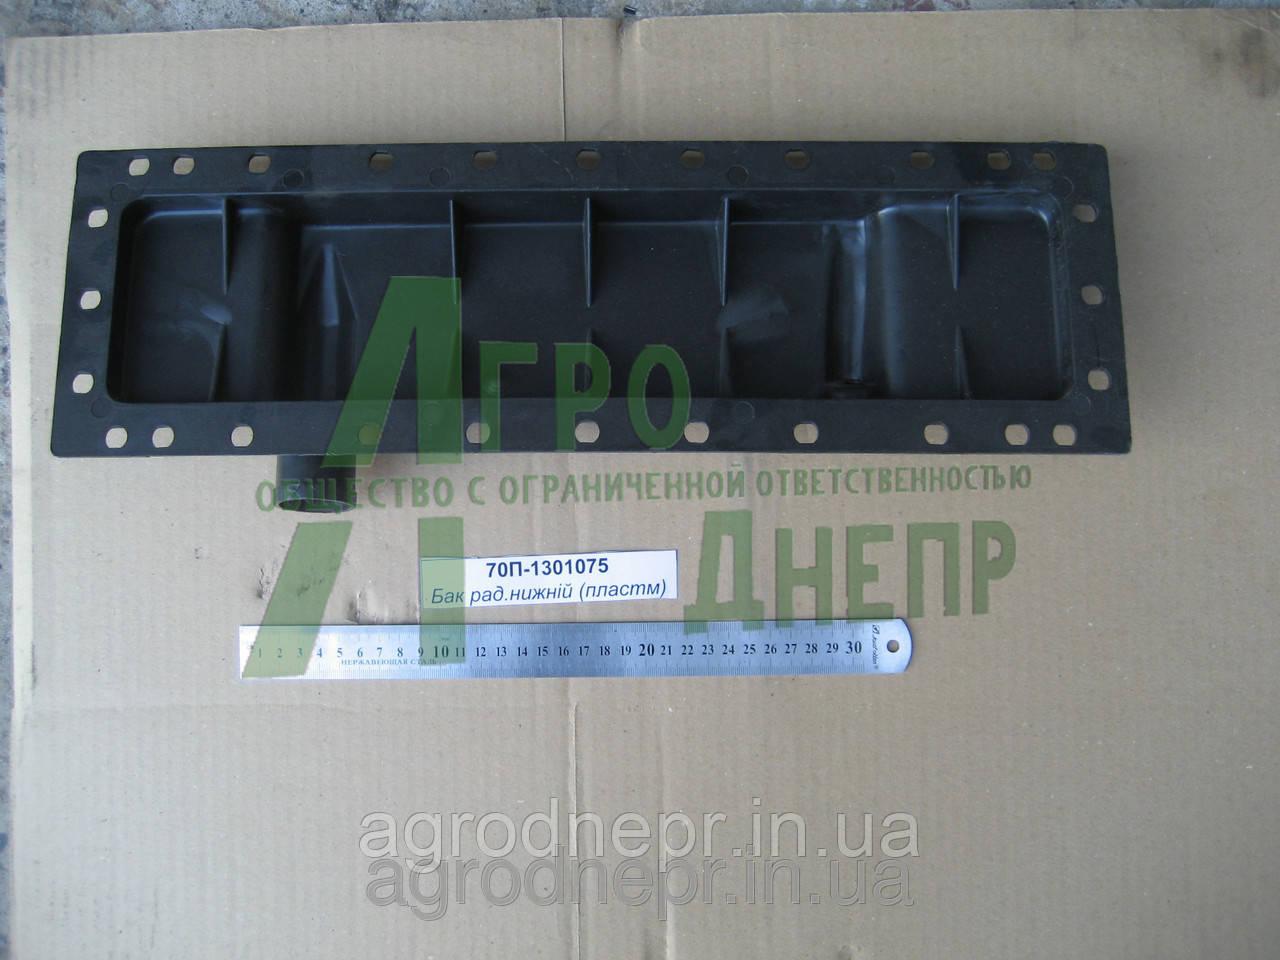 Бак радиатора нижний МТЗ(пластик) 70П-1301075